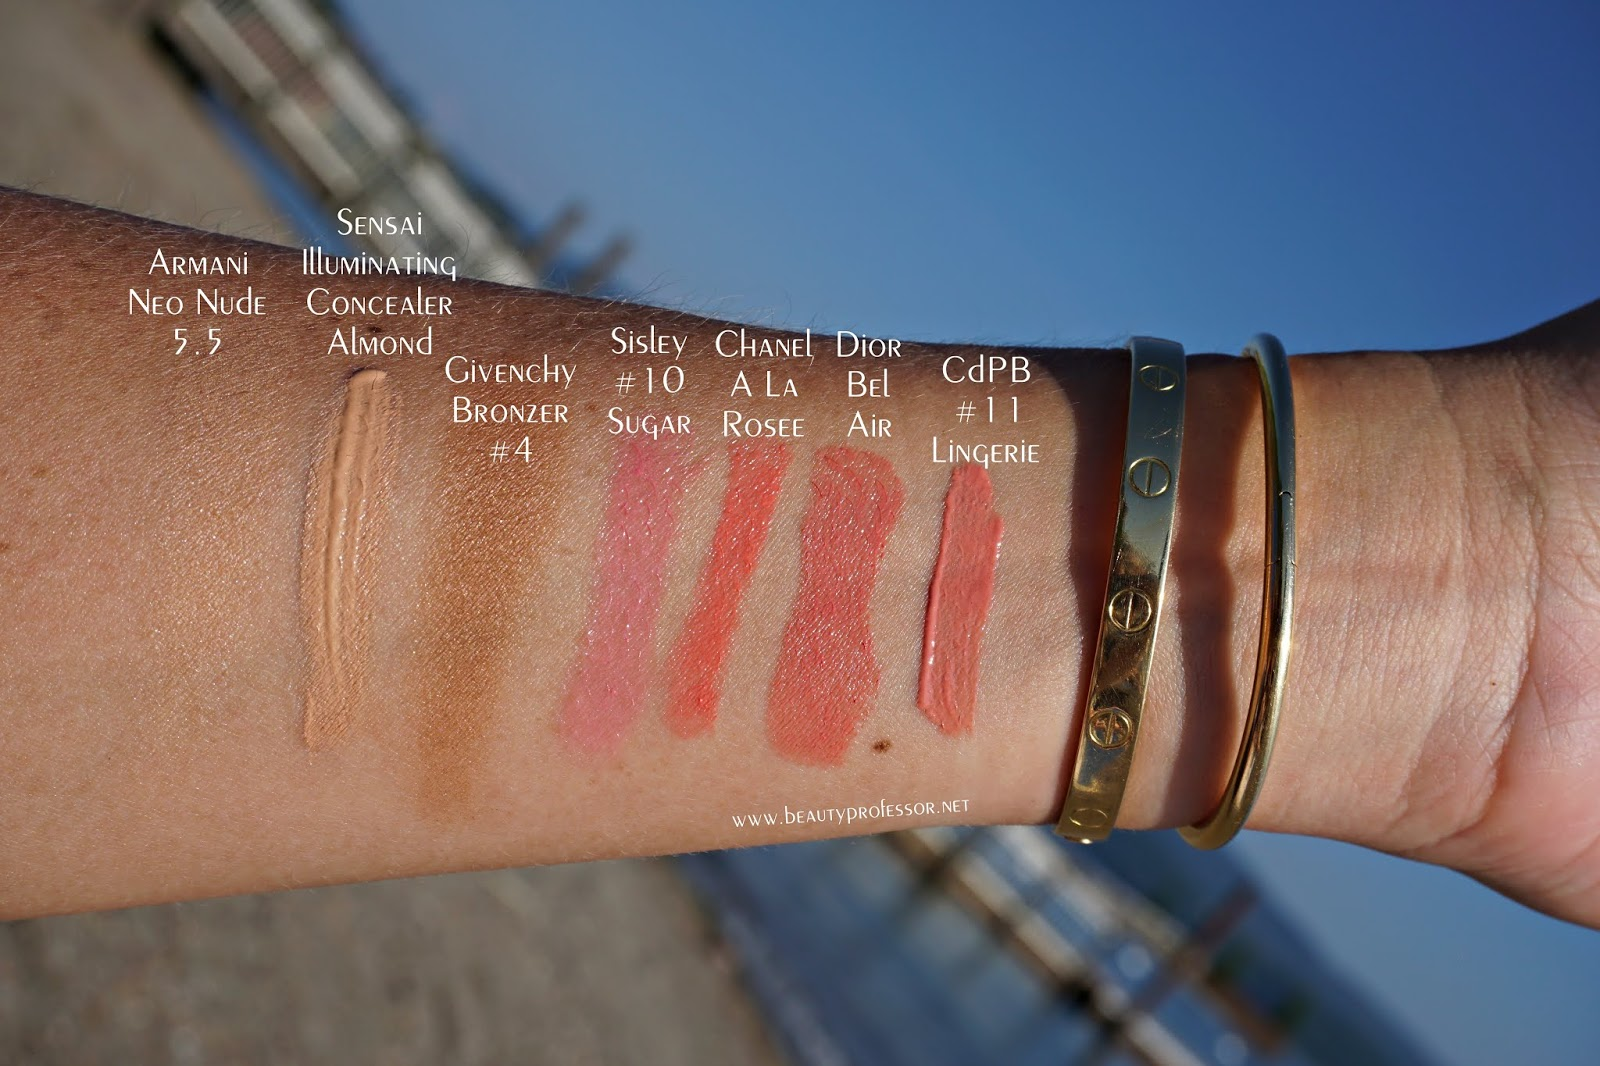 19ded3fc3824 The Surratt Beauty Lid Lacquers + My Beachside Beauty Essentials ...